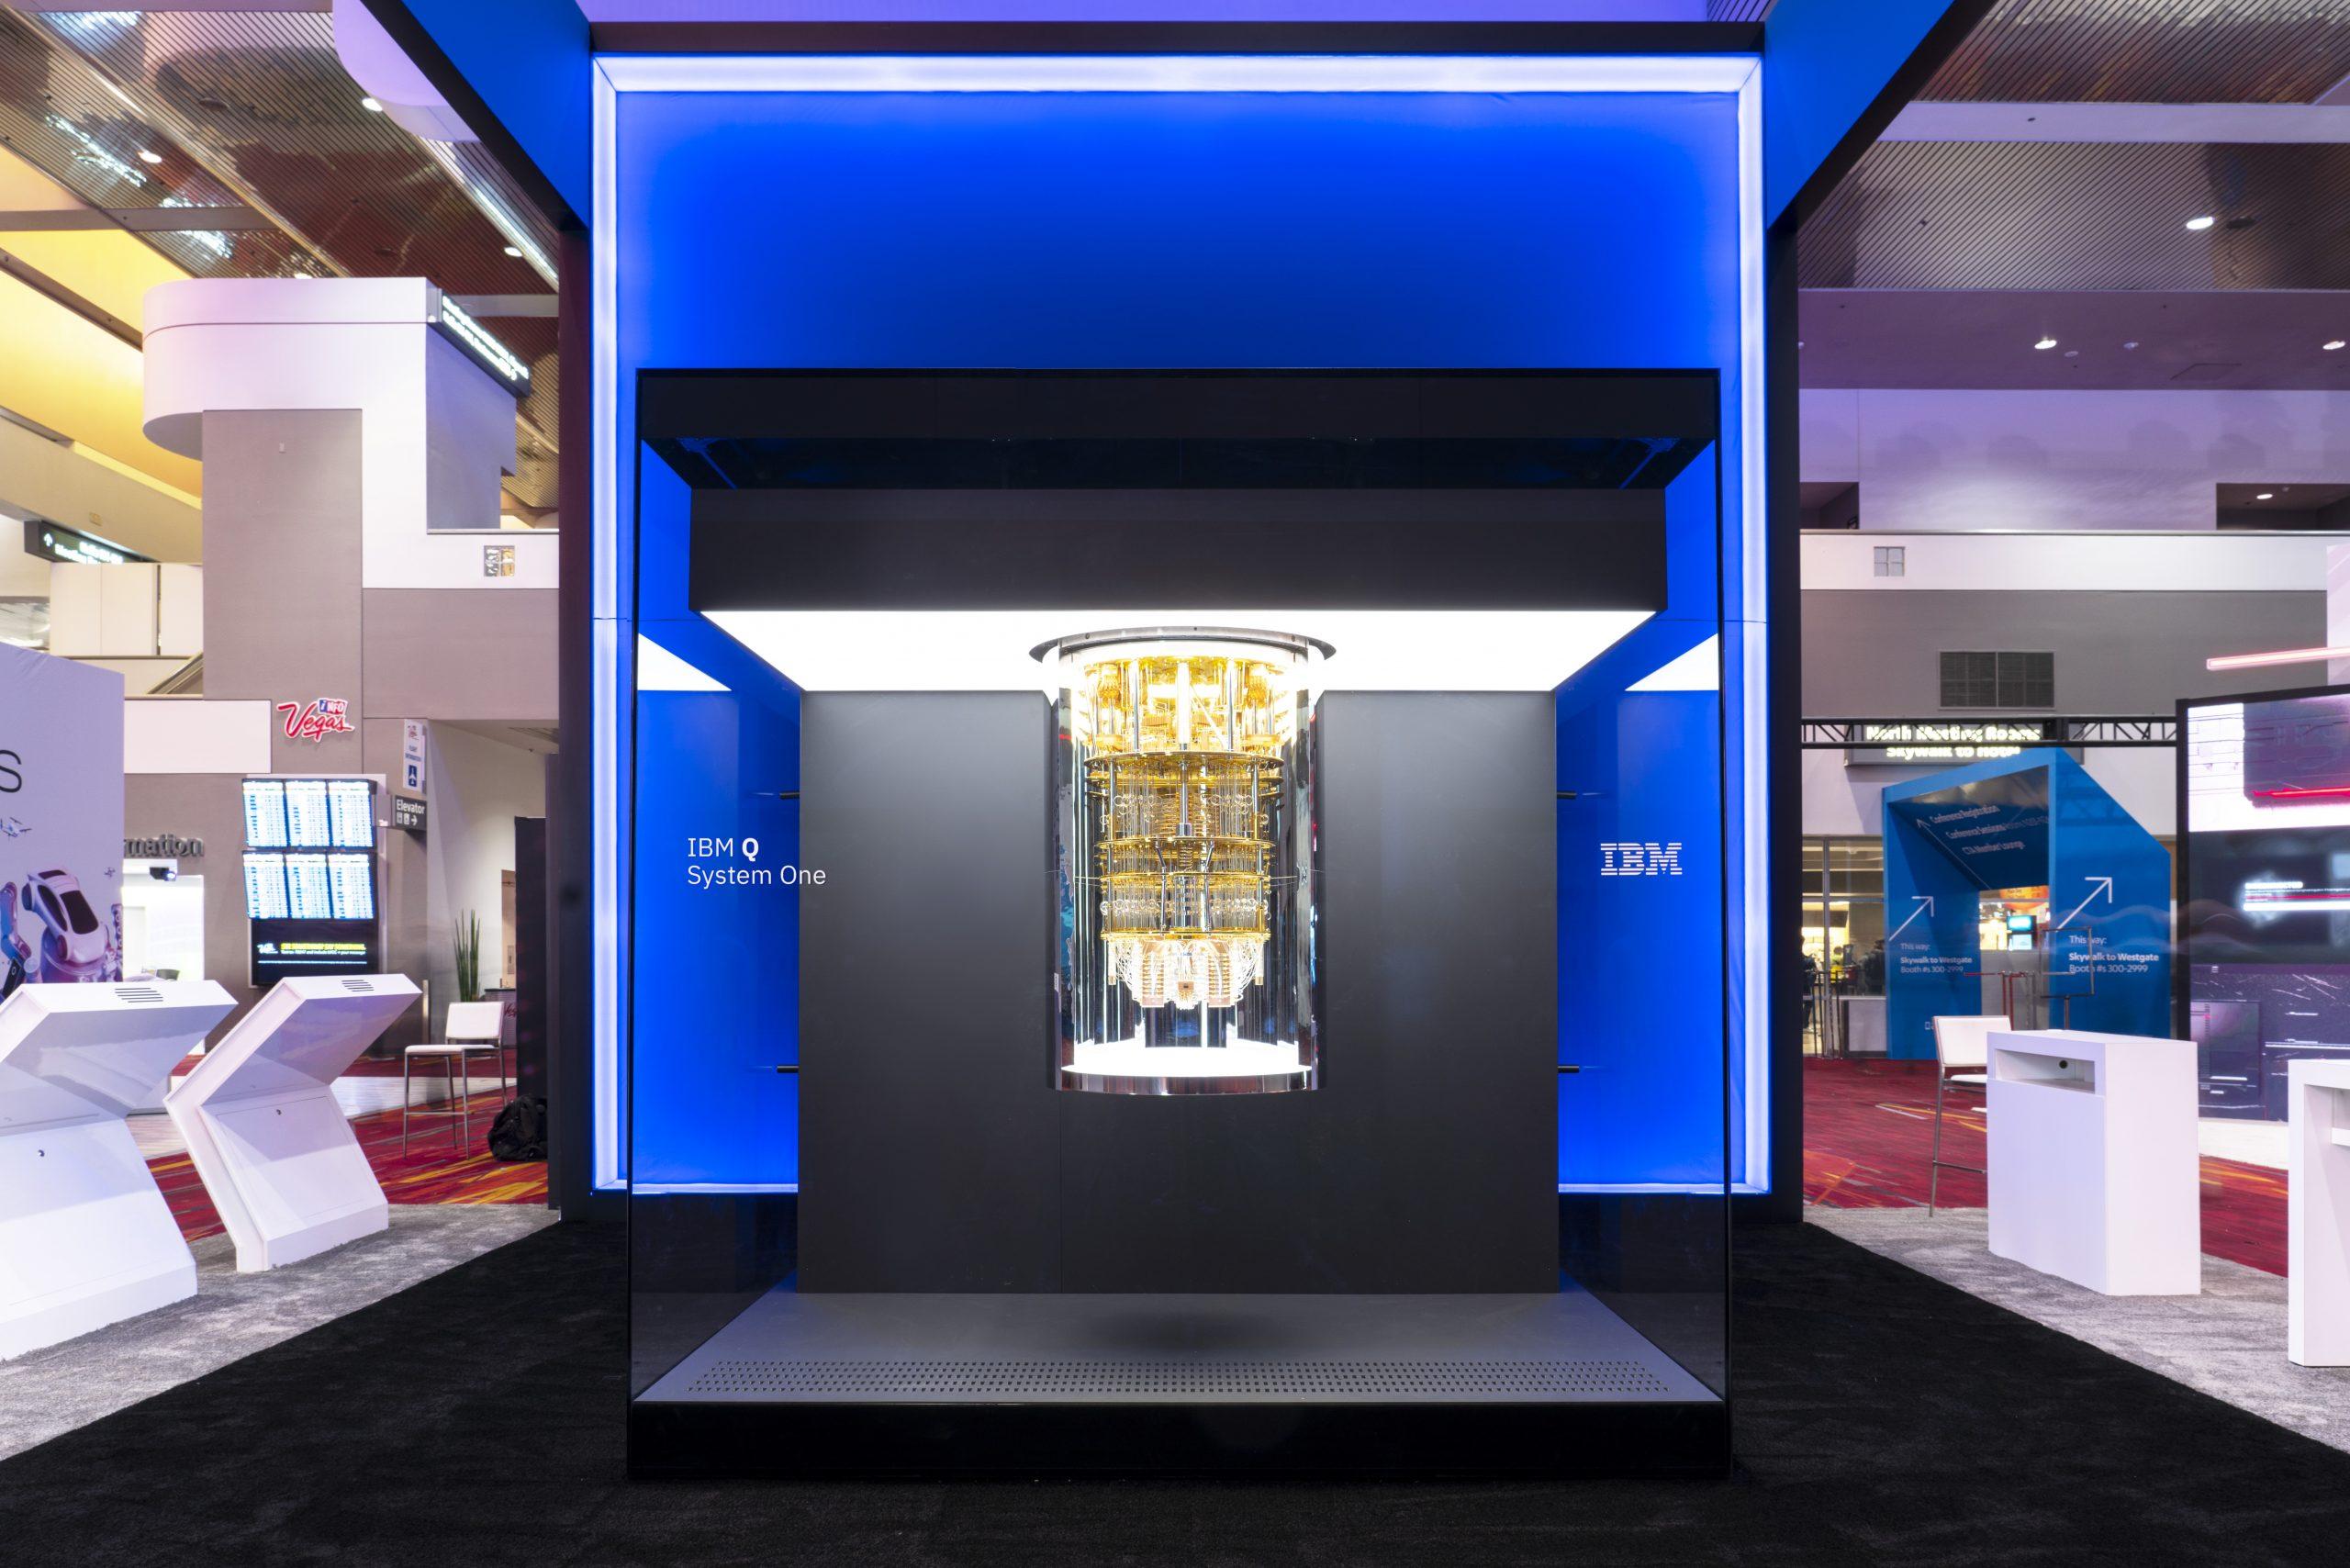 IBM Delivers Its Highest Quantum Volume to Date